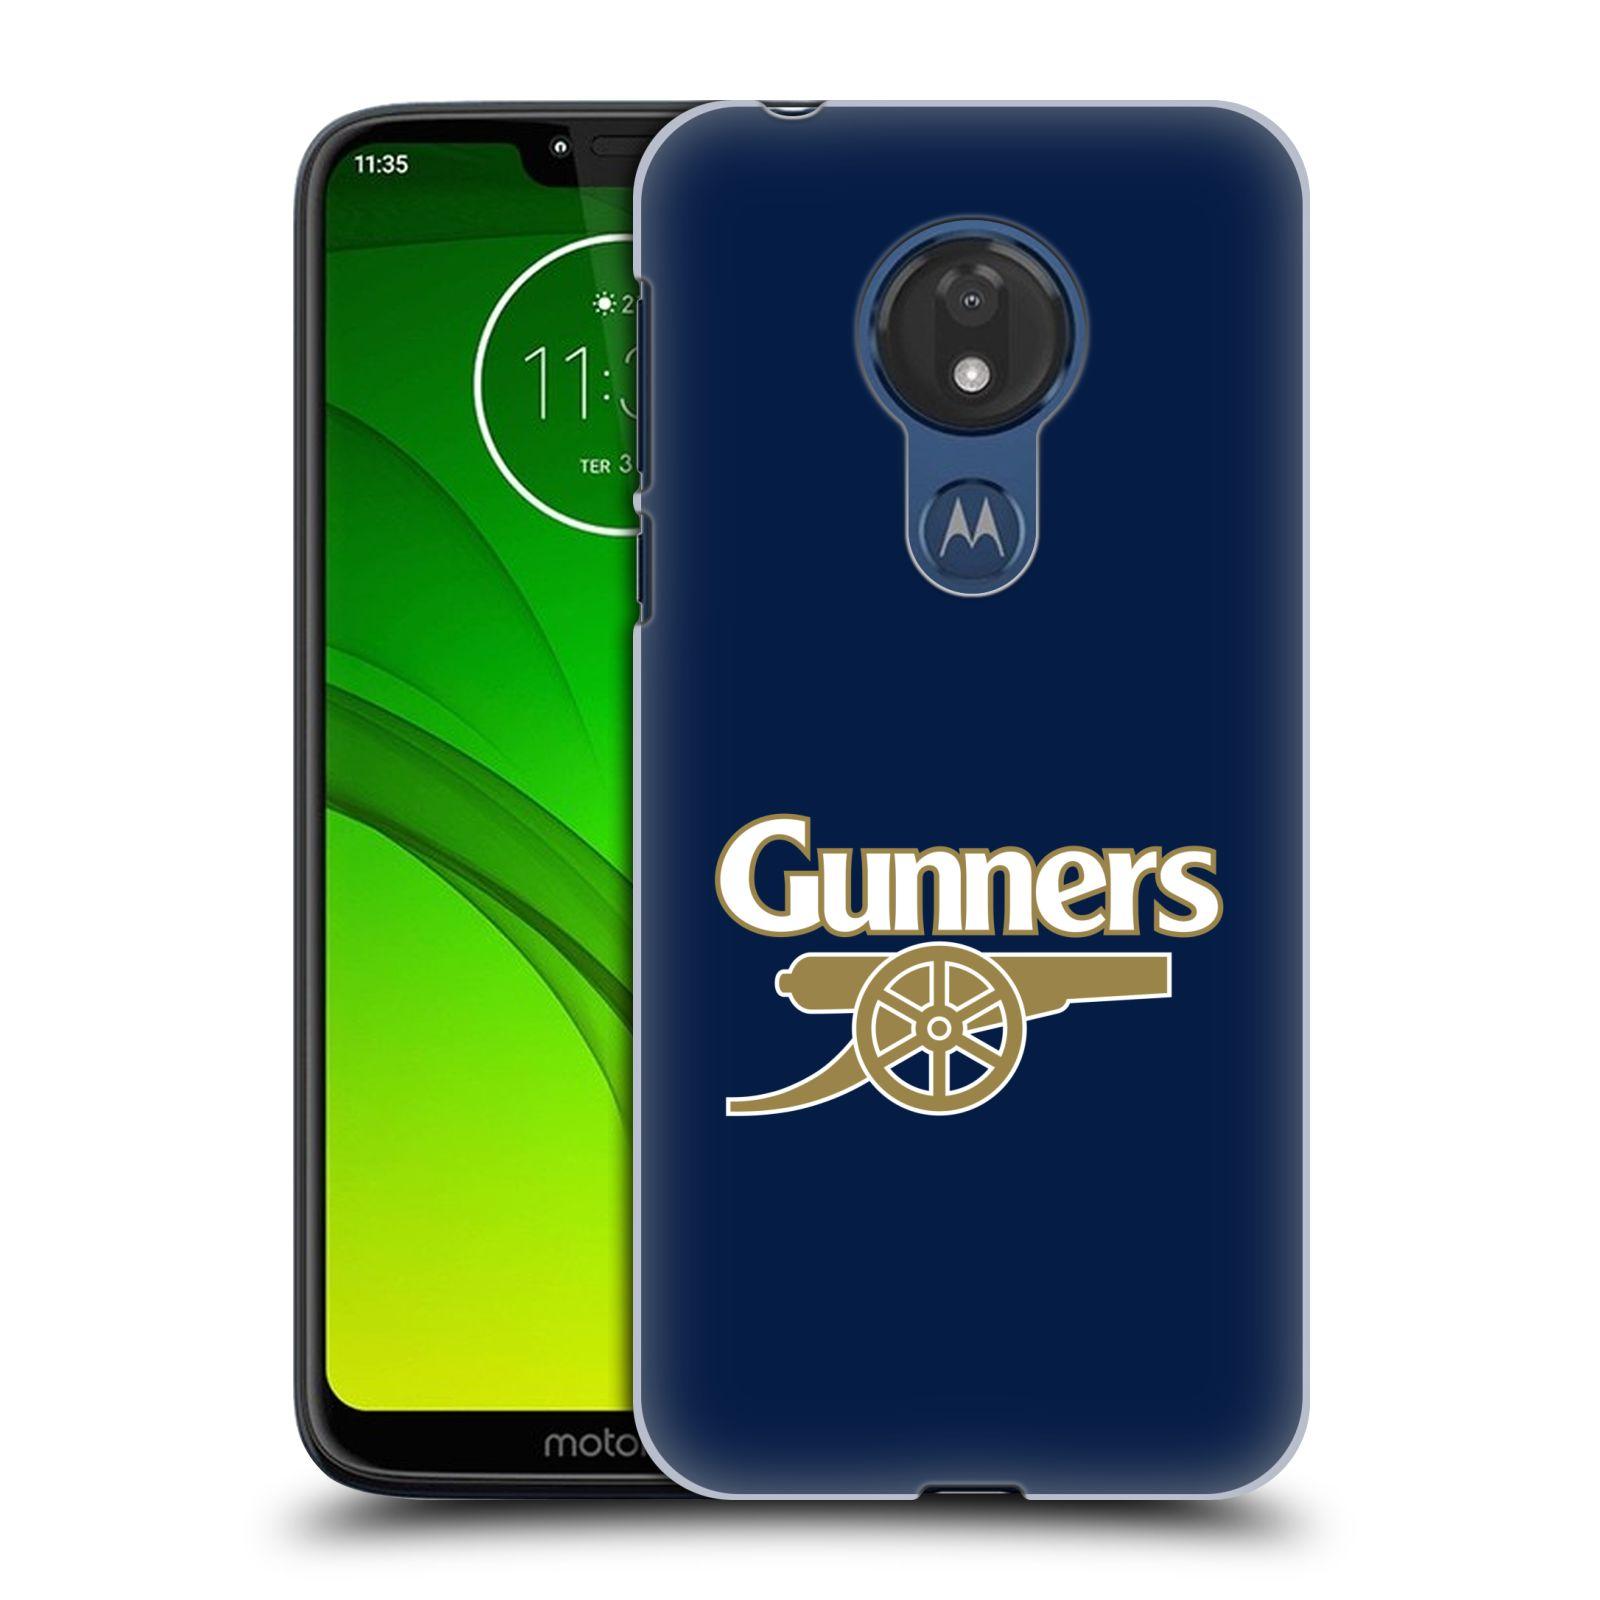 Plastové pouzdro na mobil Motorola Moto G7 Power - Head Case - Arsenal FC - Gunners